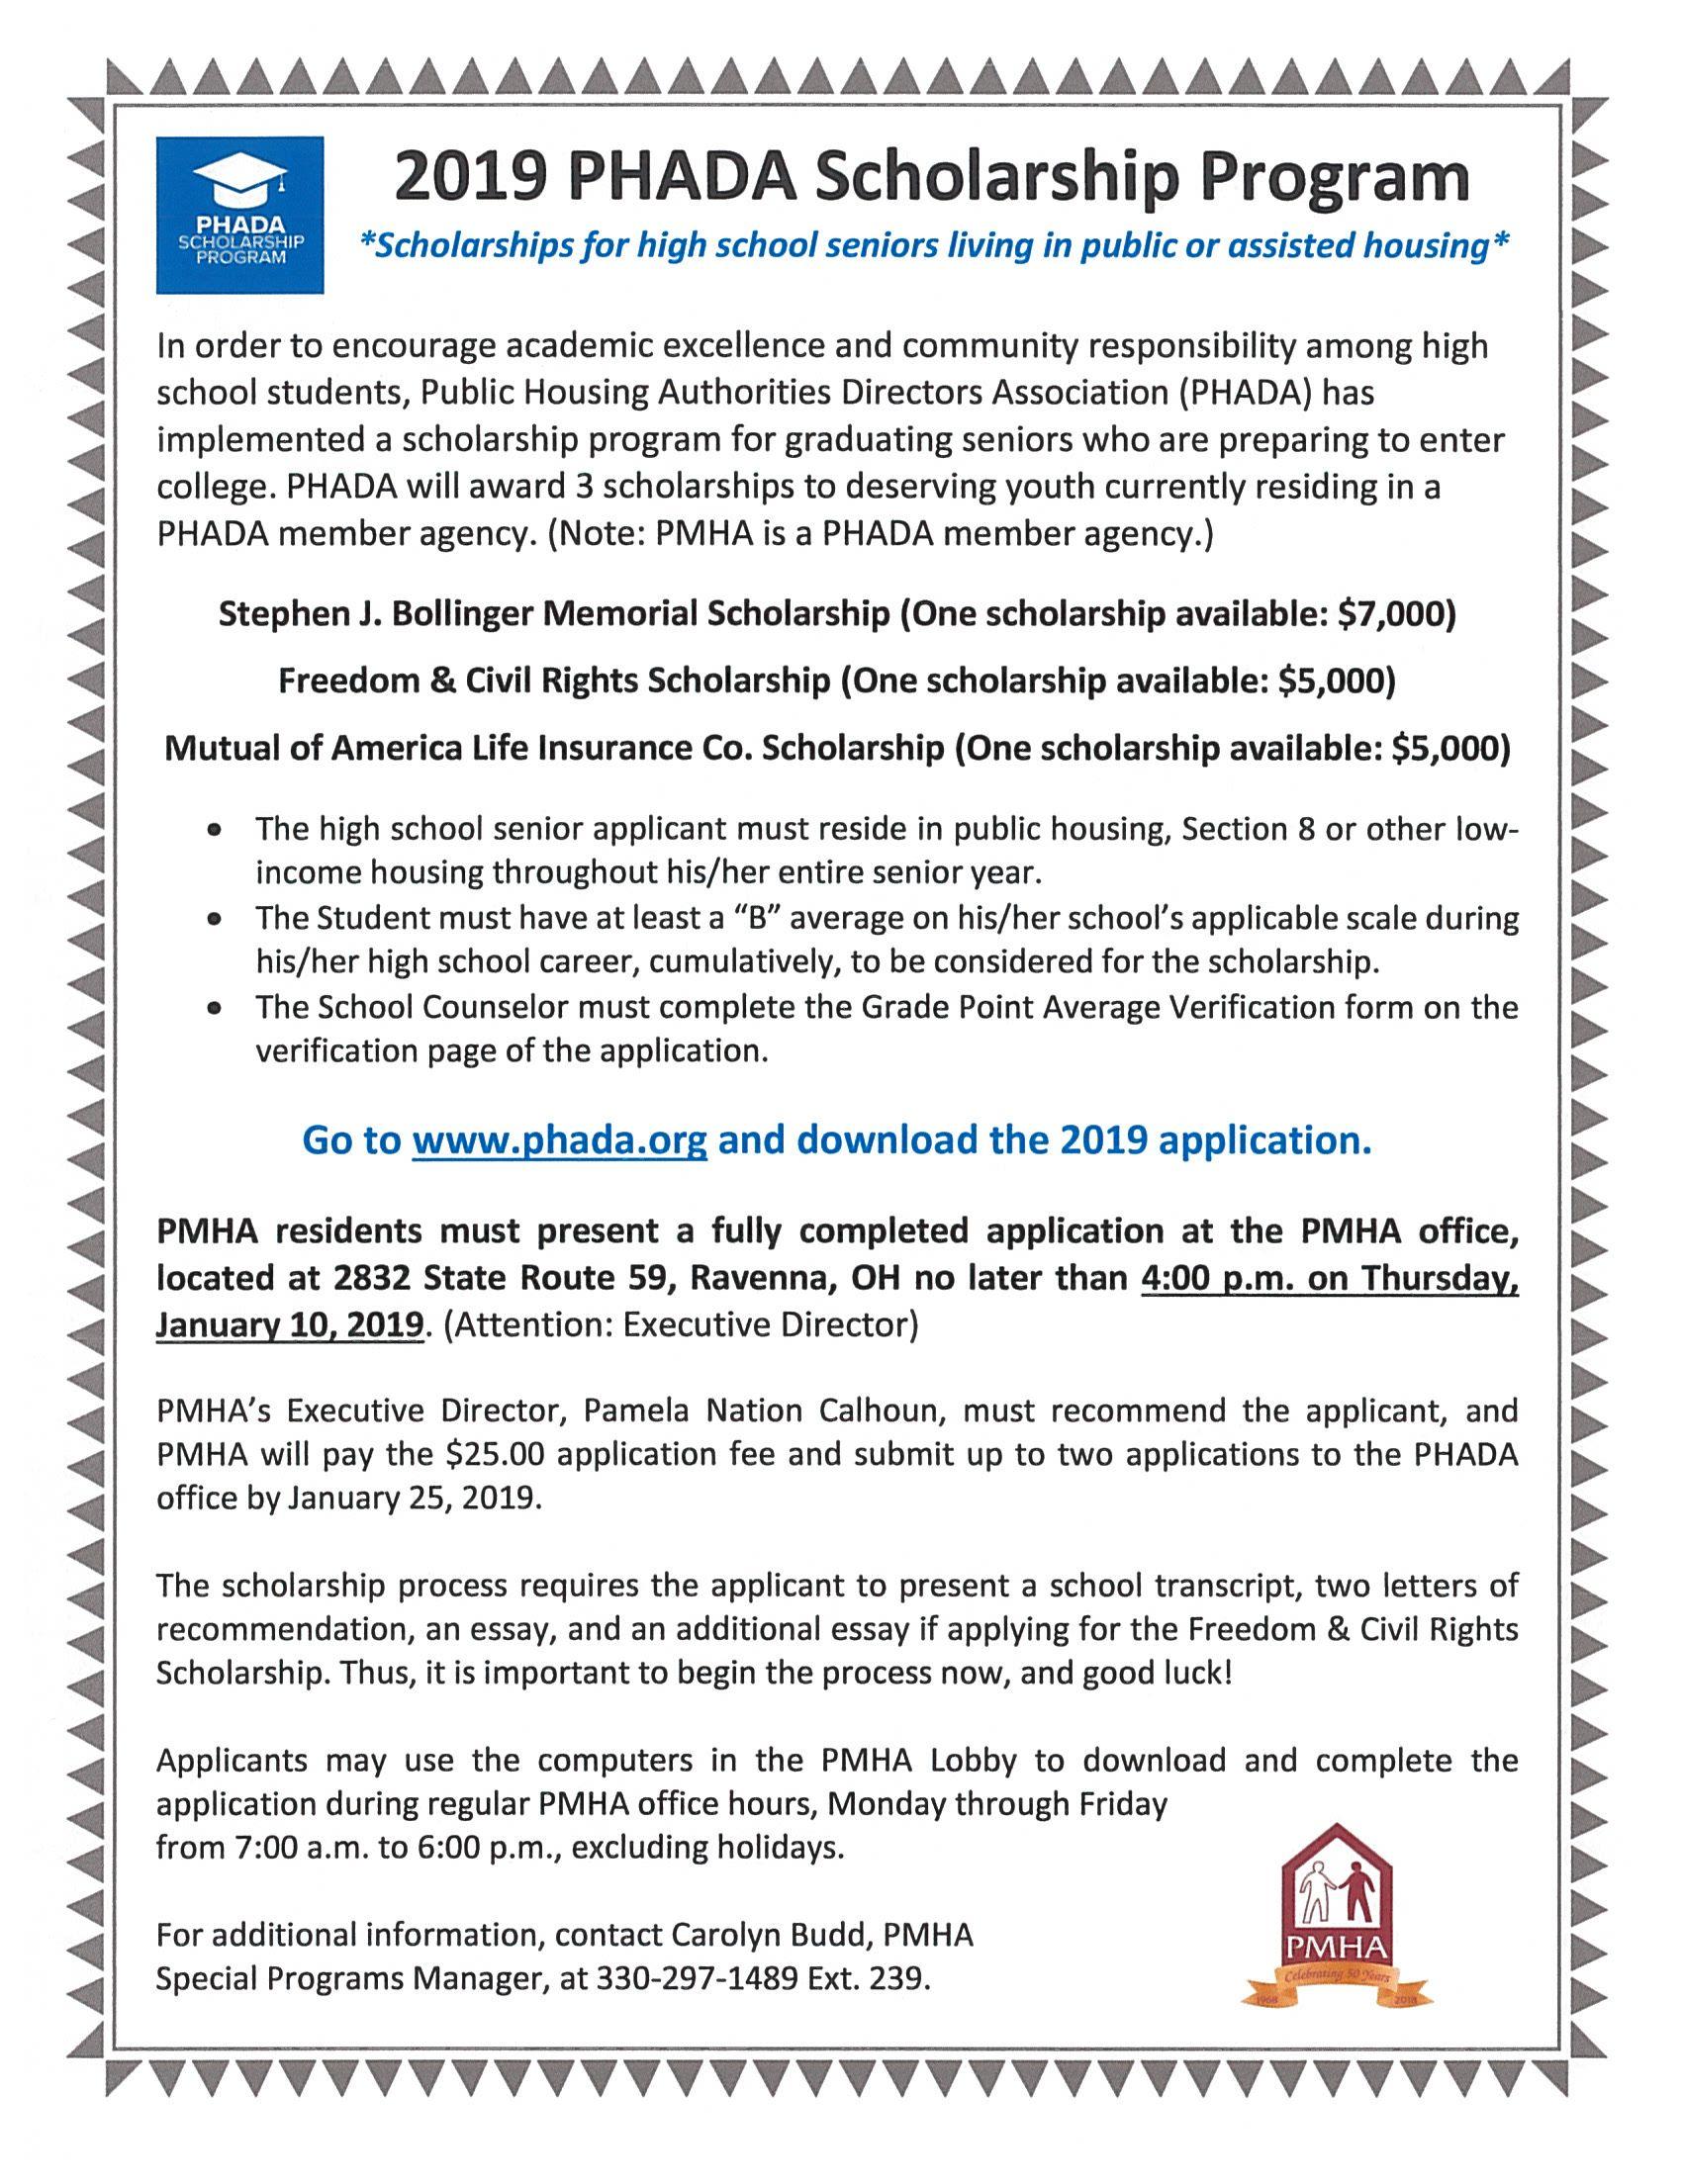 11-12-18 OHIO SCHOLARSHIP ALERT! 2019 PHADA - Portage